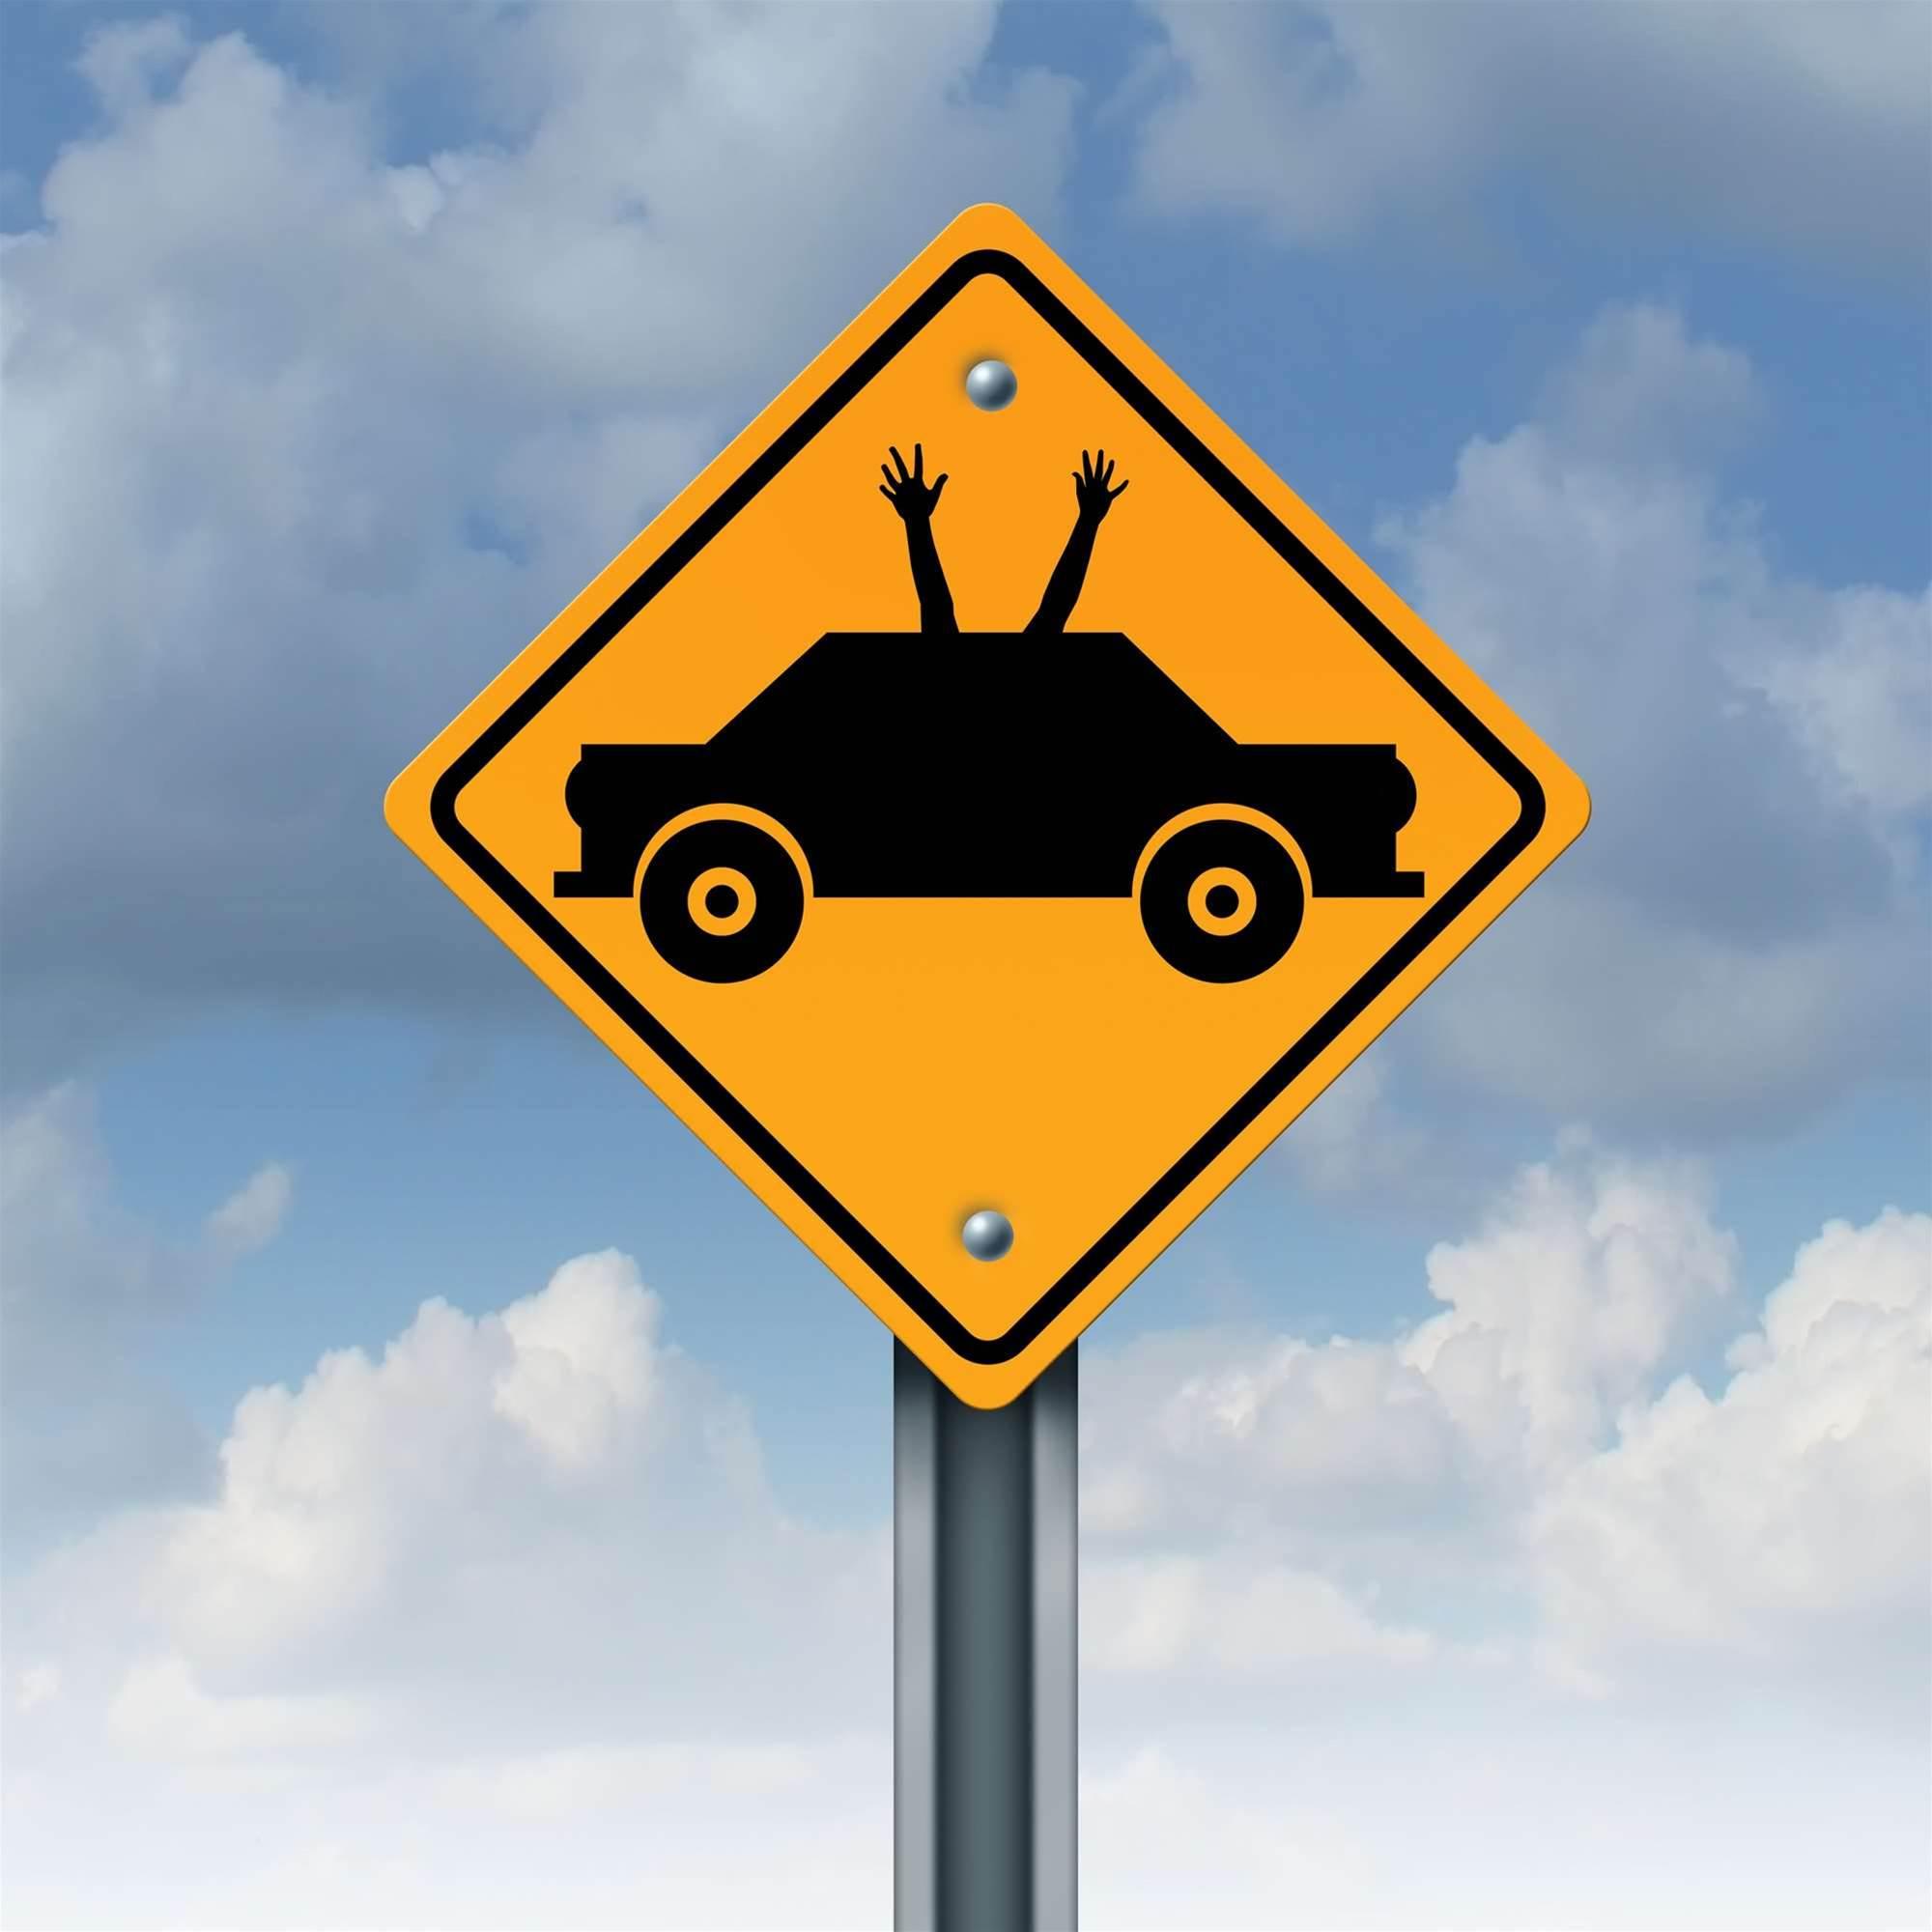 South Australia sinks $10 million into driverless cars